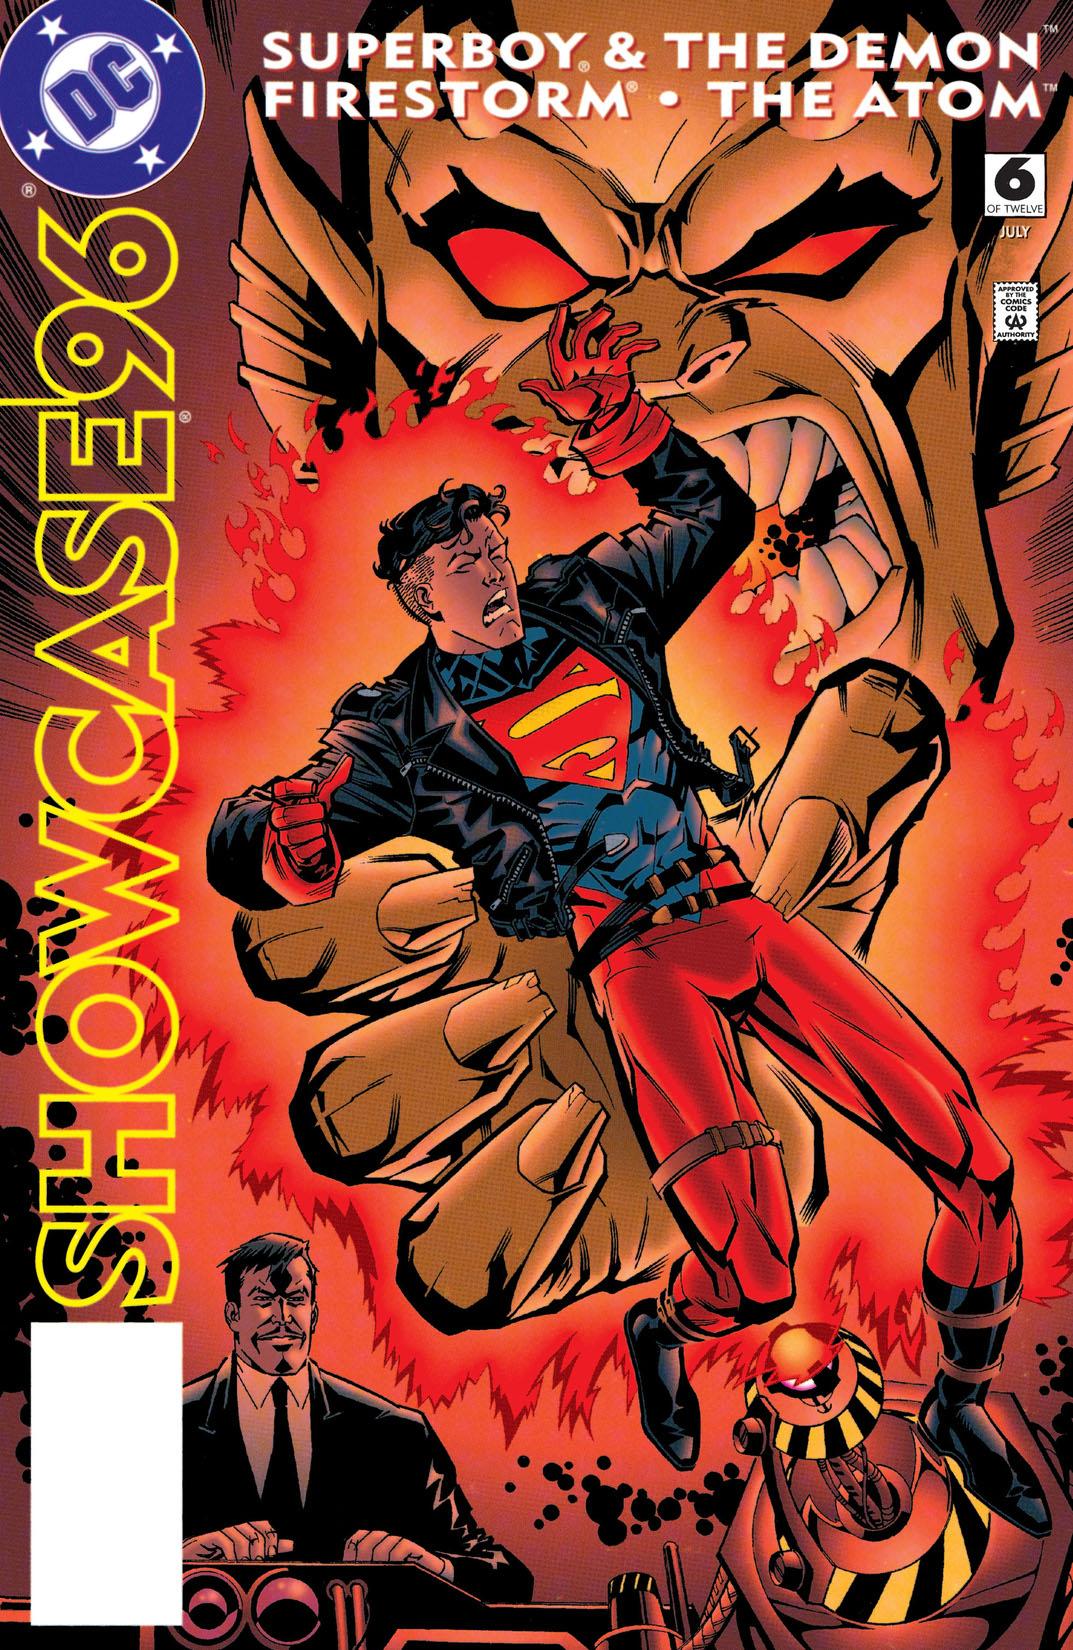 1st Birds of Prey DC 1996 2 copies available Showcase /'96 #3 CGC 9.6